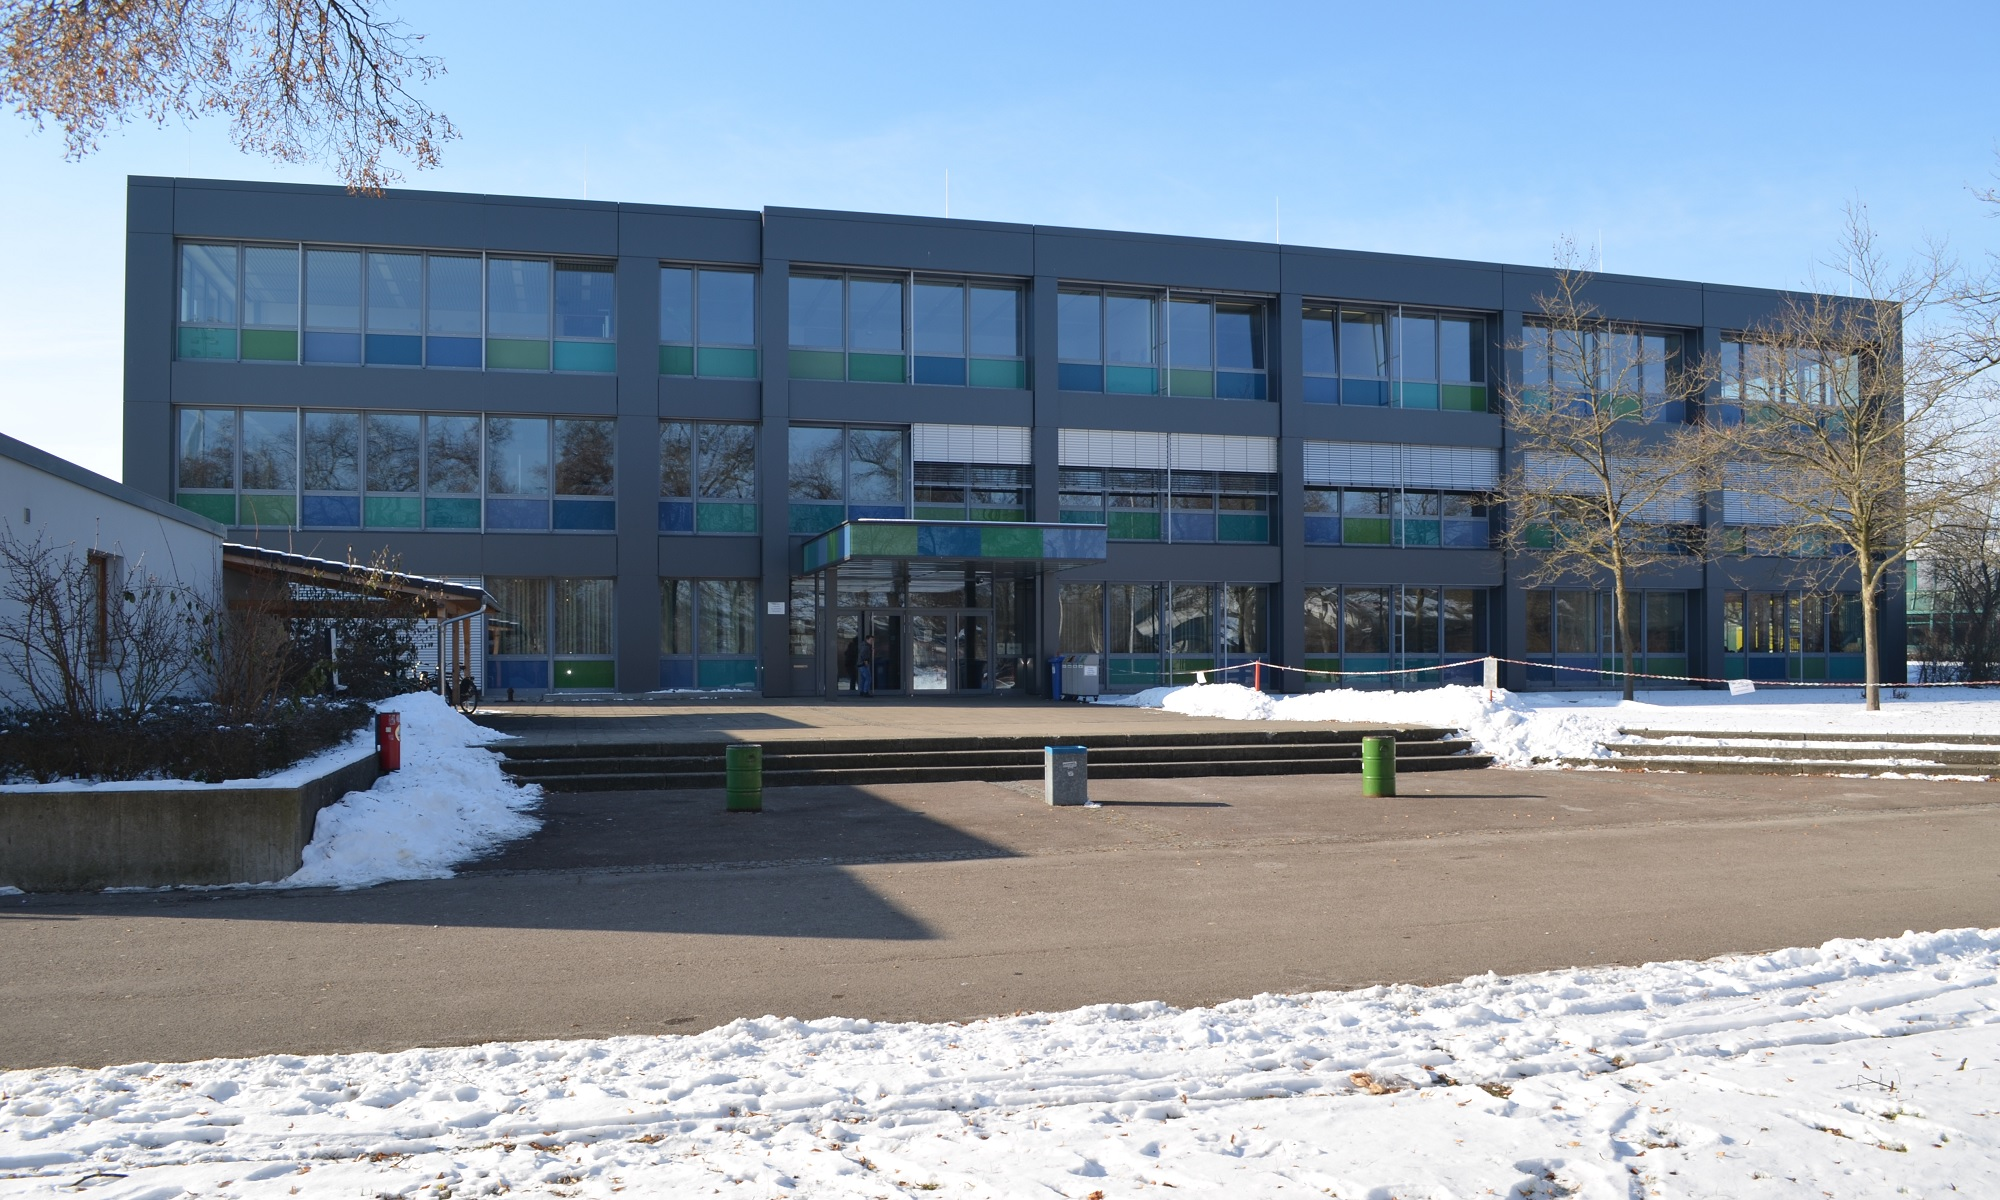 Ludwig-Bölkow-Schule